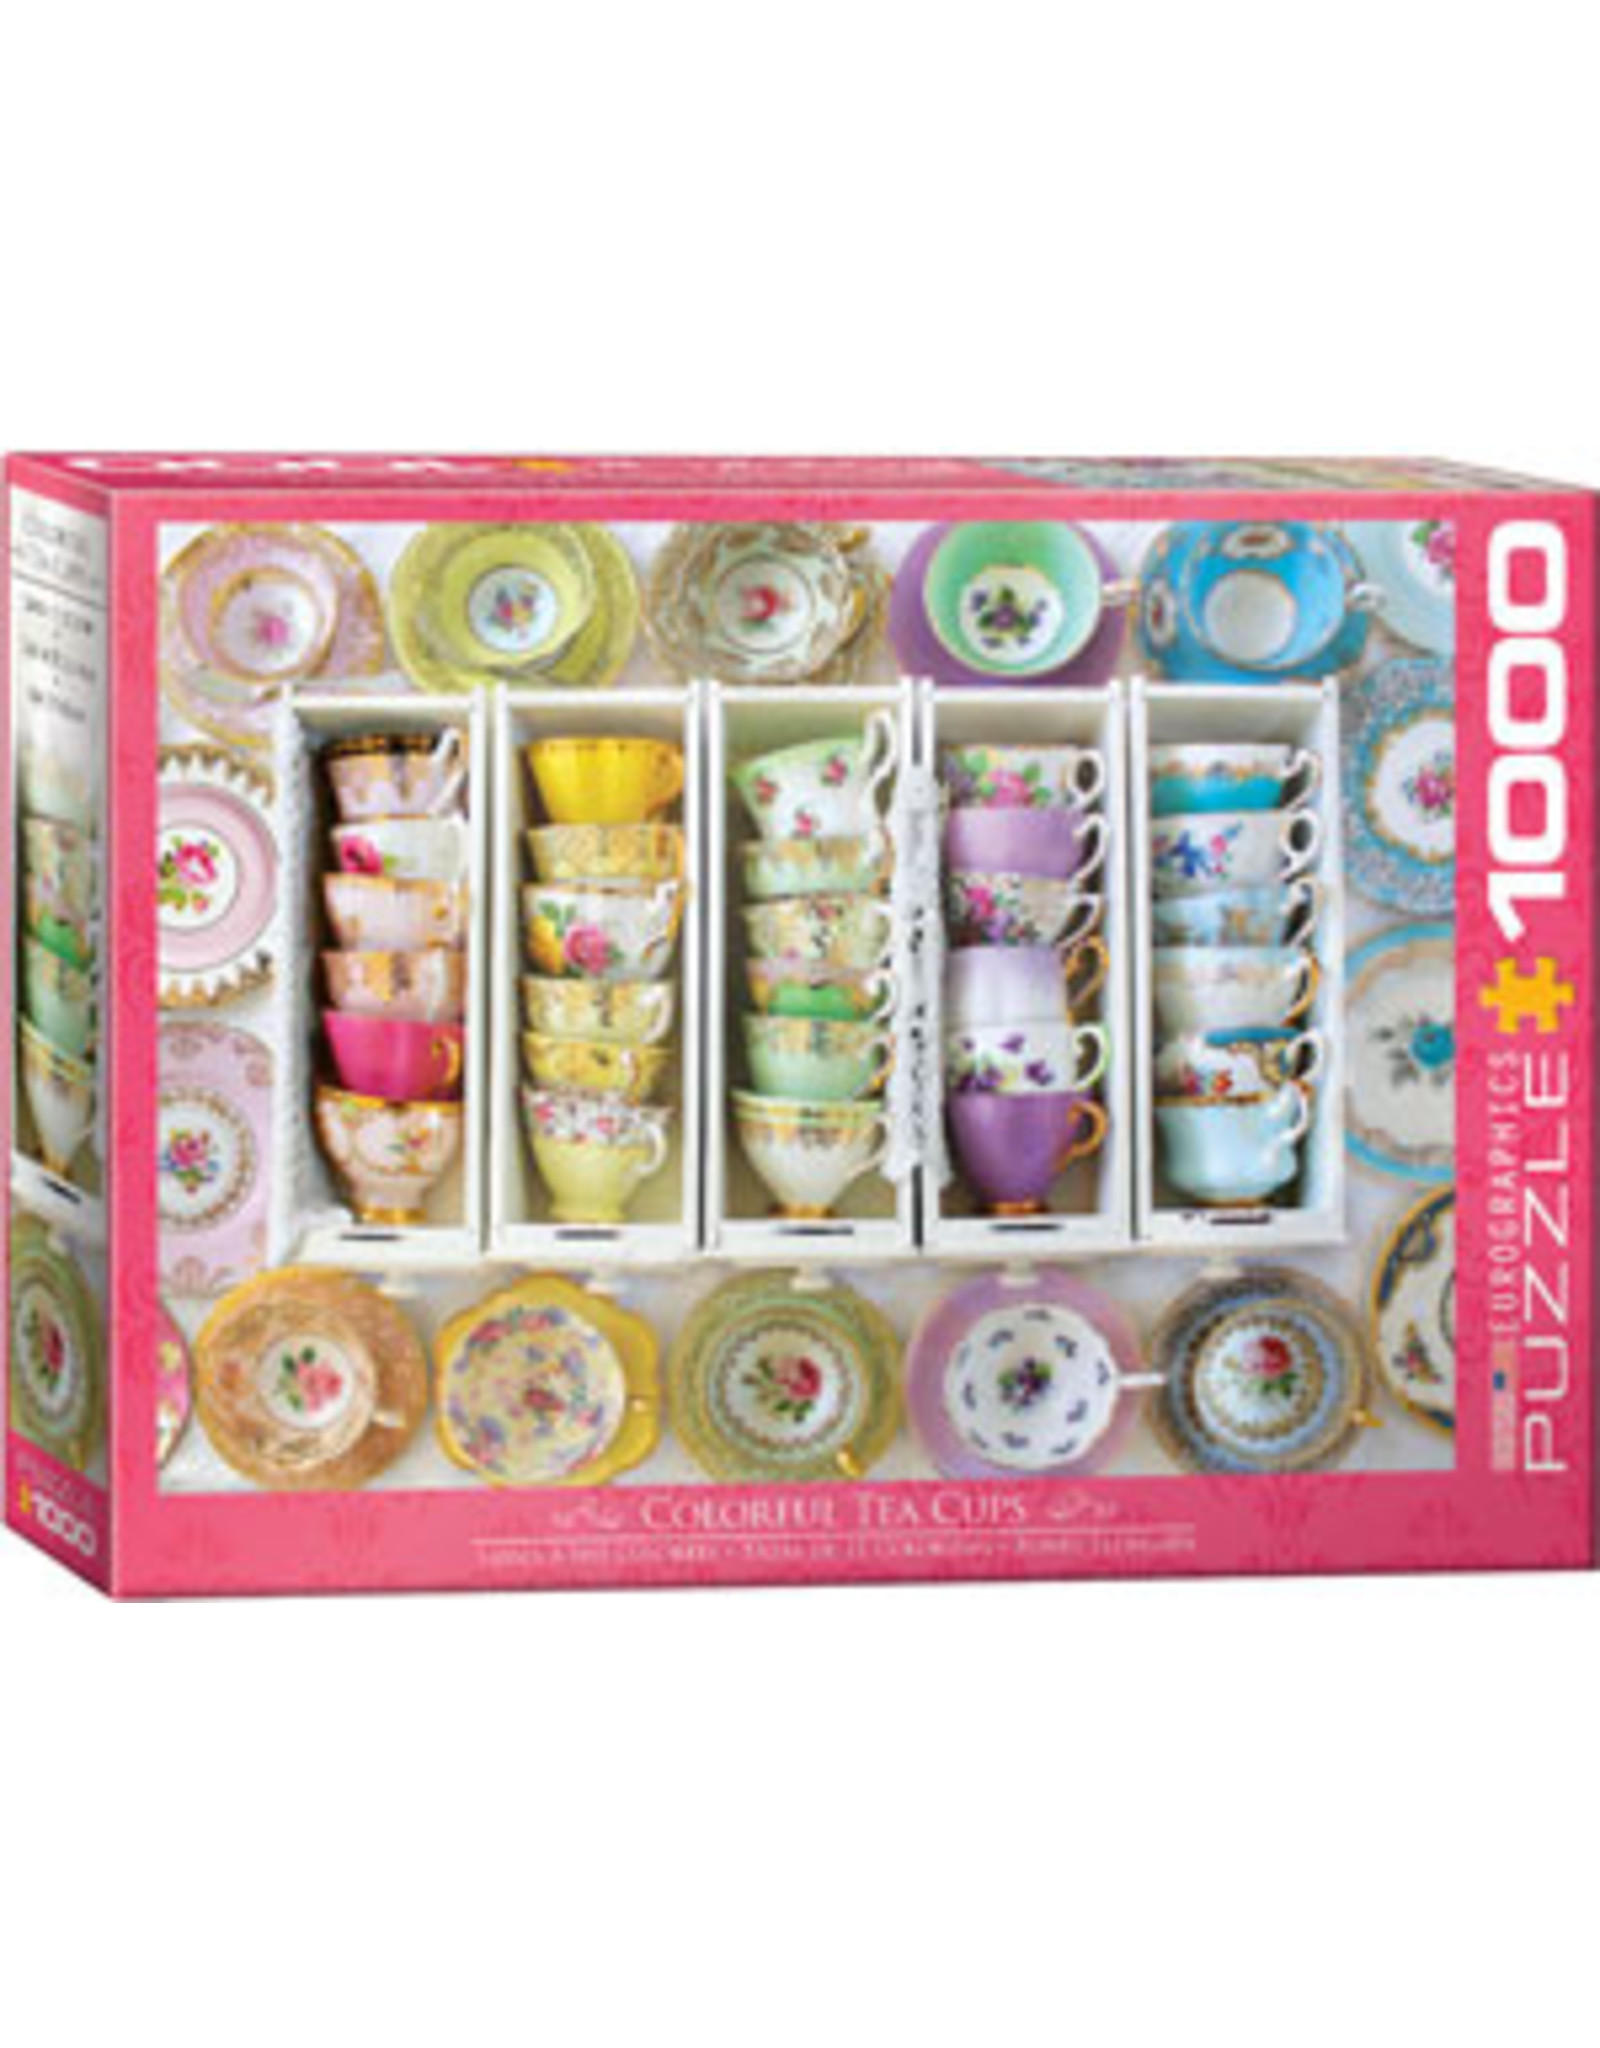 Eurographics Colorful Tea Cups